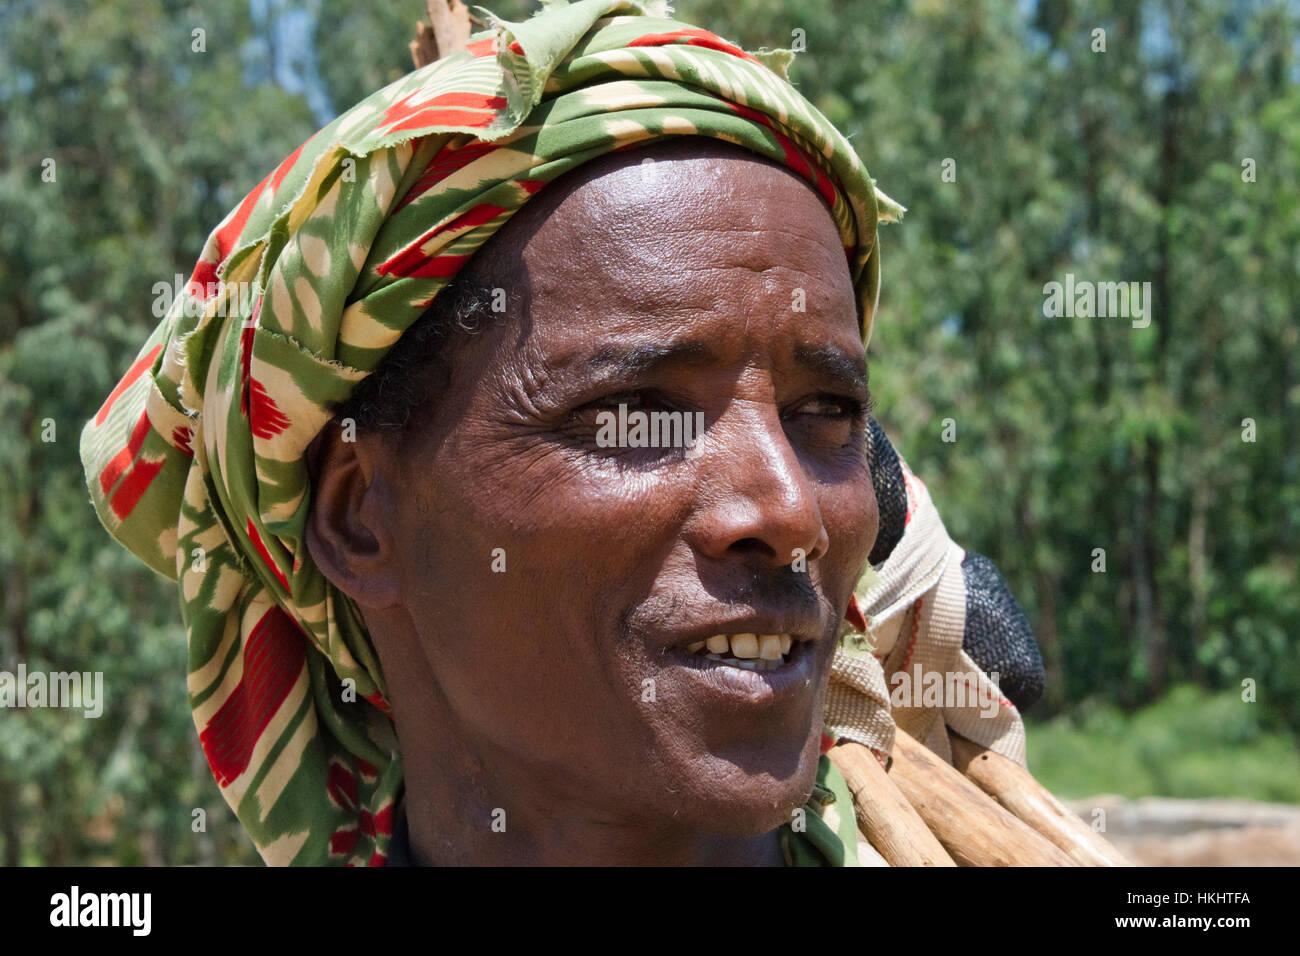 Portrait of a farmer, Aksum, Ethiopia - Stock Image